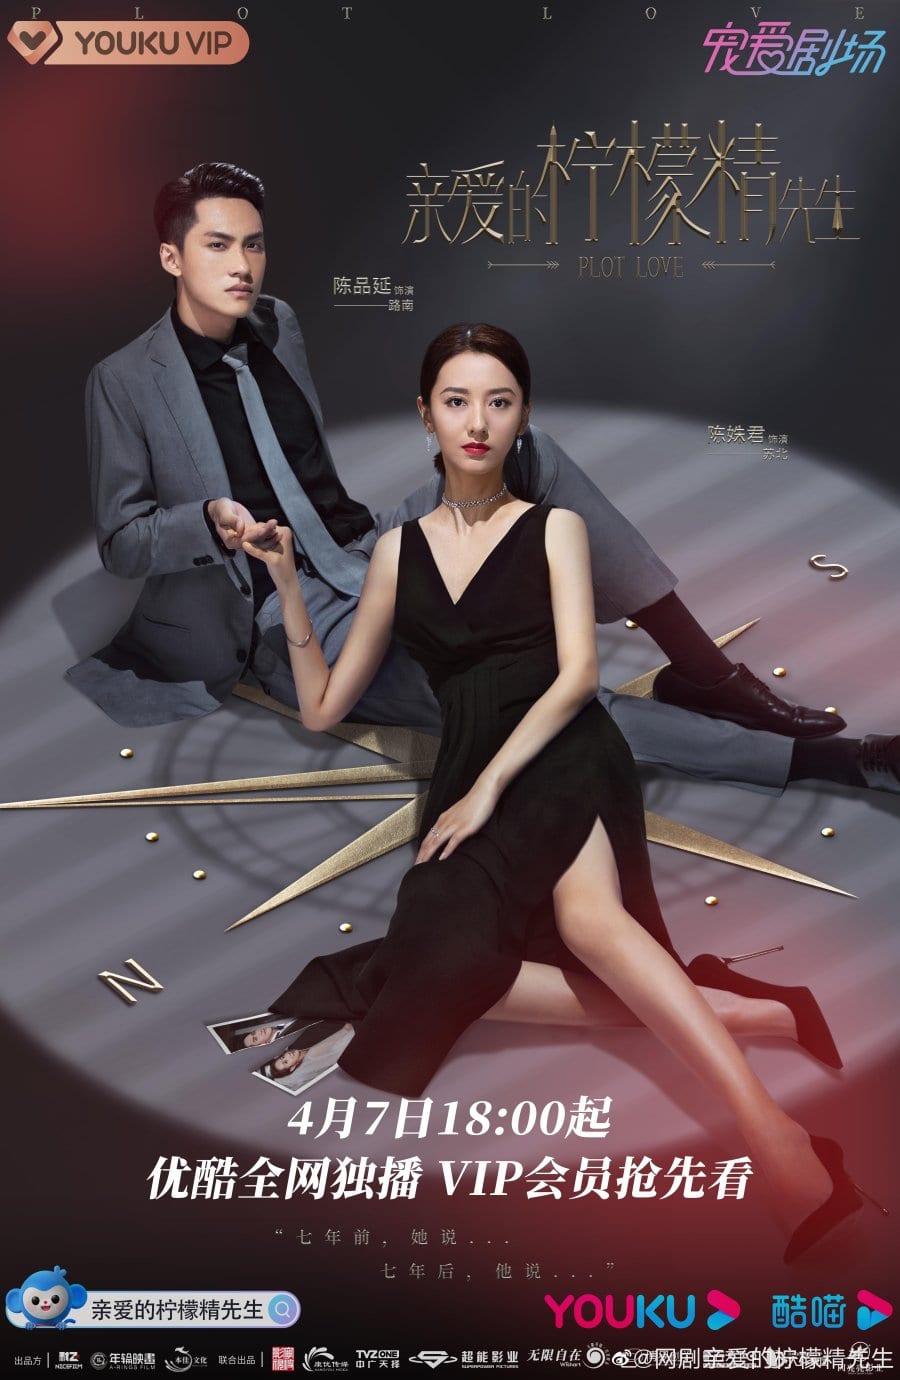 how to watch Plot Love 2021 chinese drama